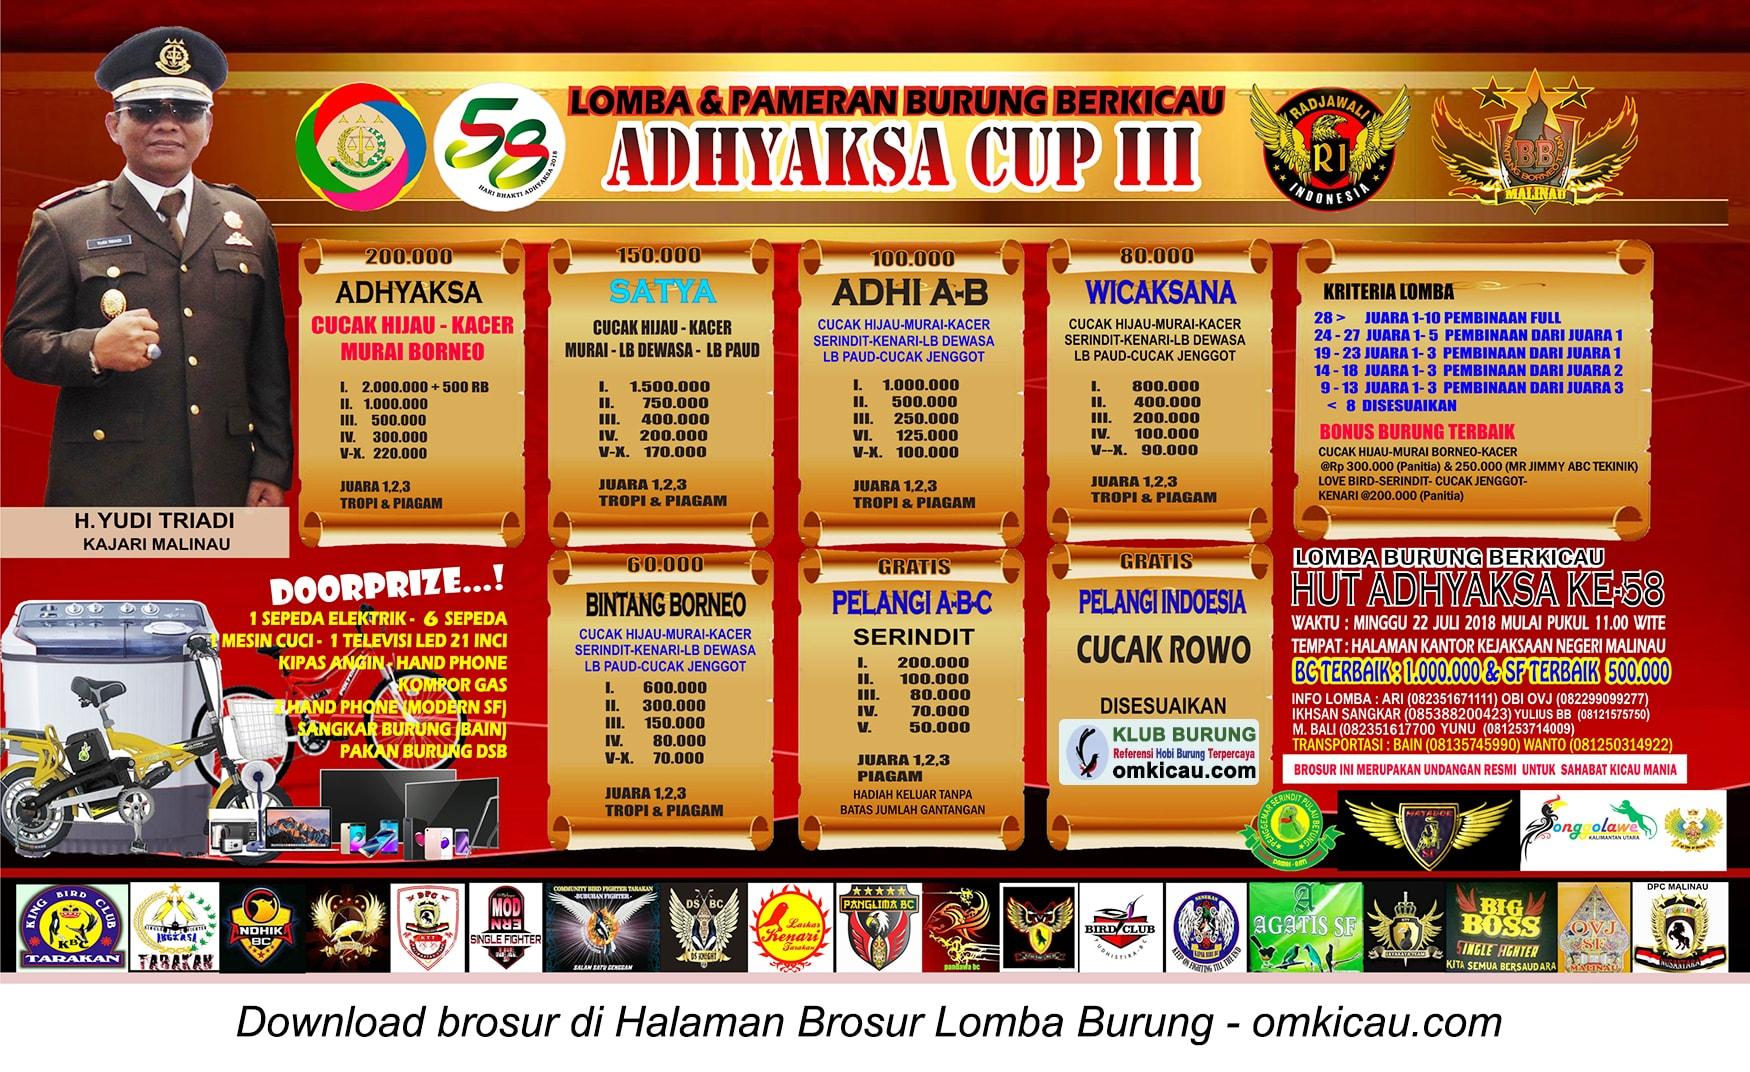 Adhyaksa Cup III